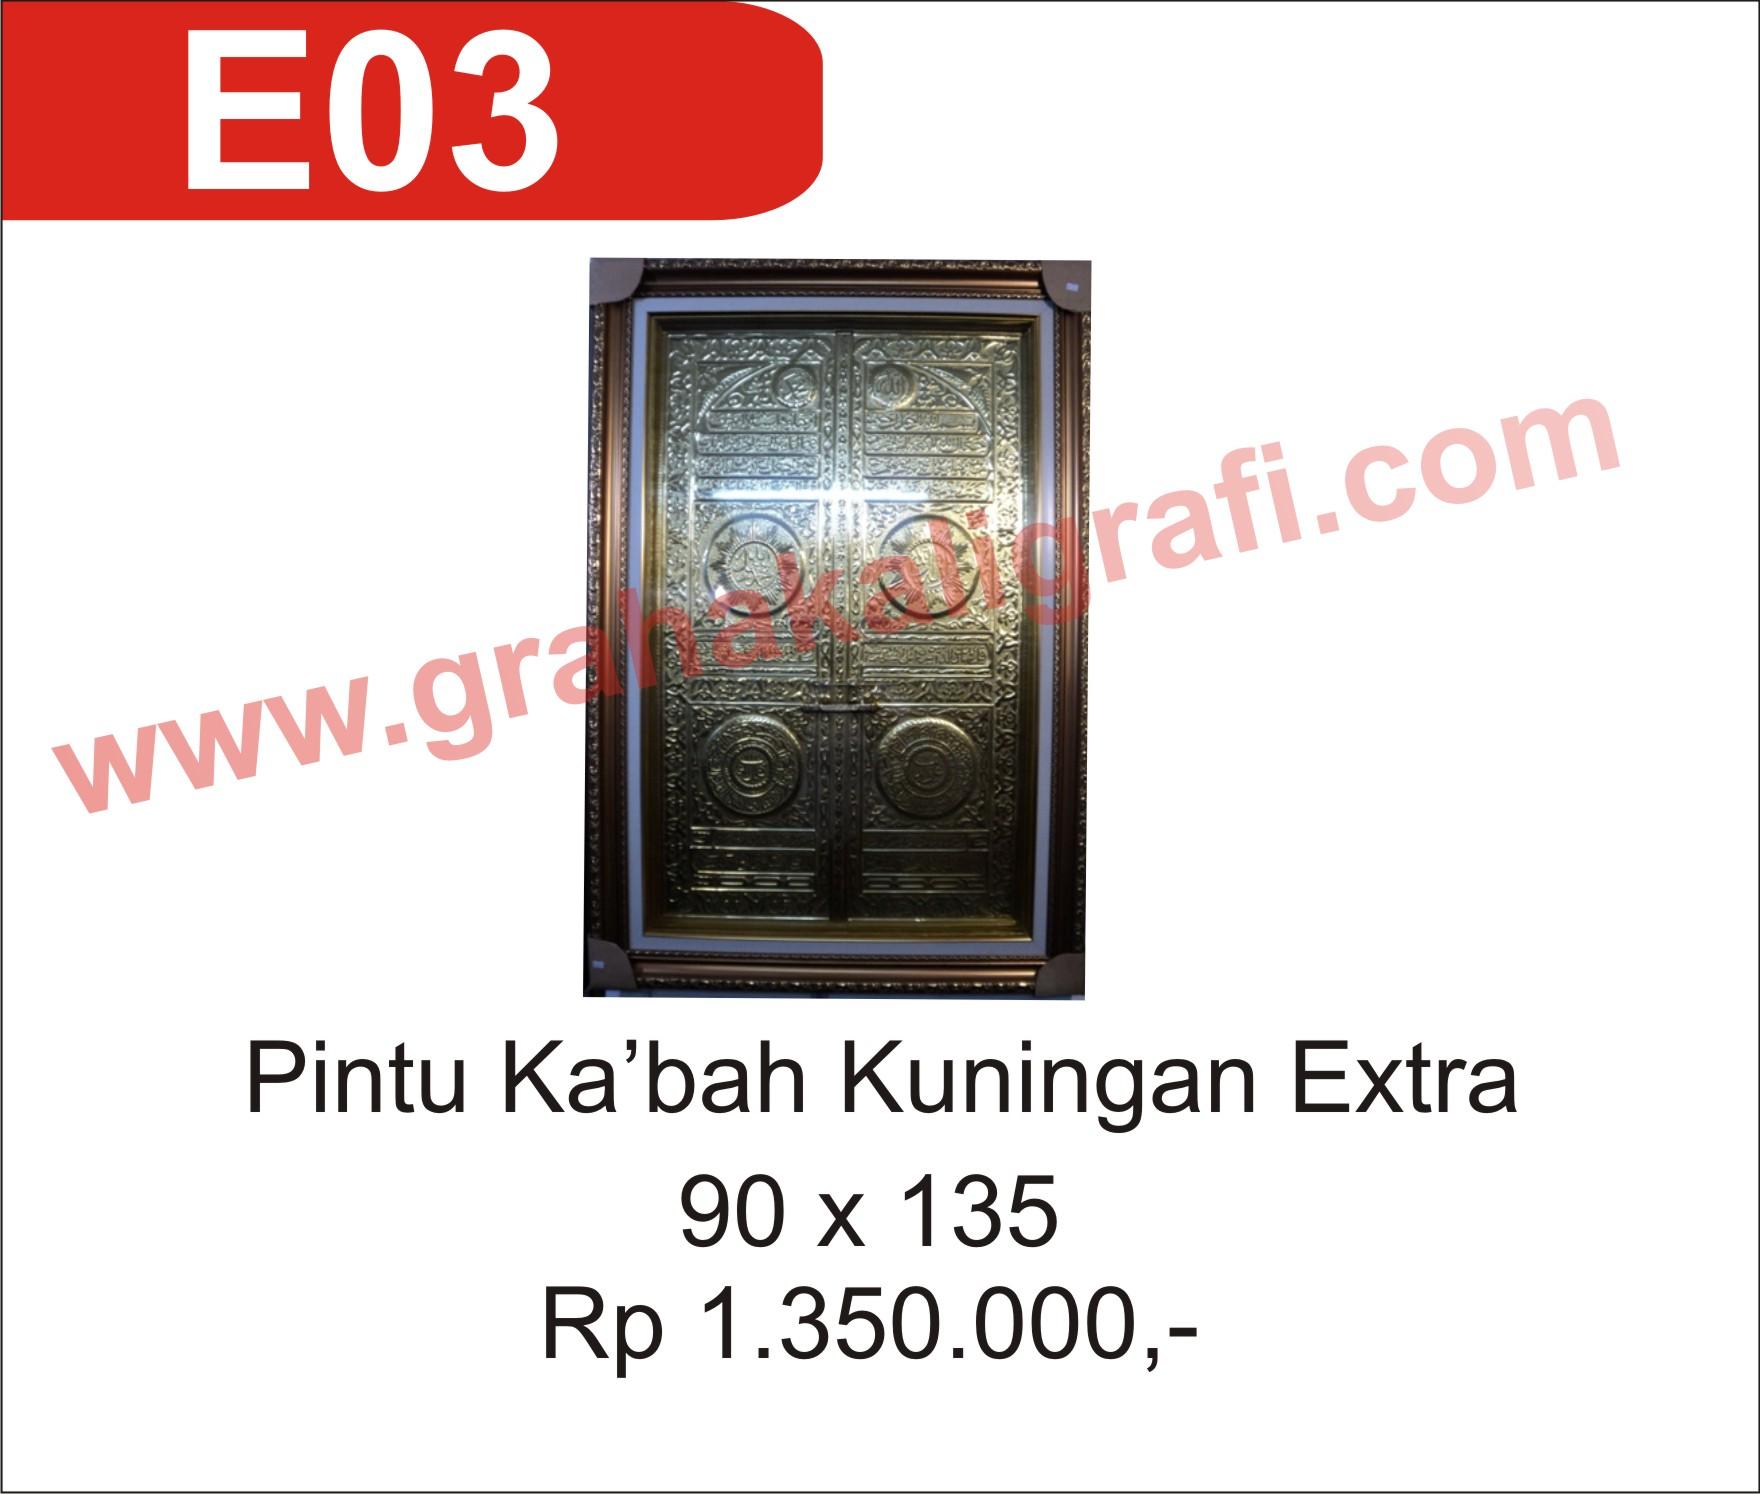 ... extra-graha-kaligrafi-e28093-kaligrafi-islam-e28093-kaligrafi-arab.jpg